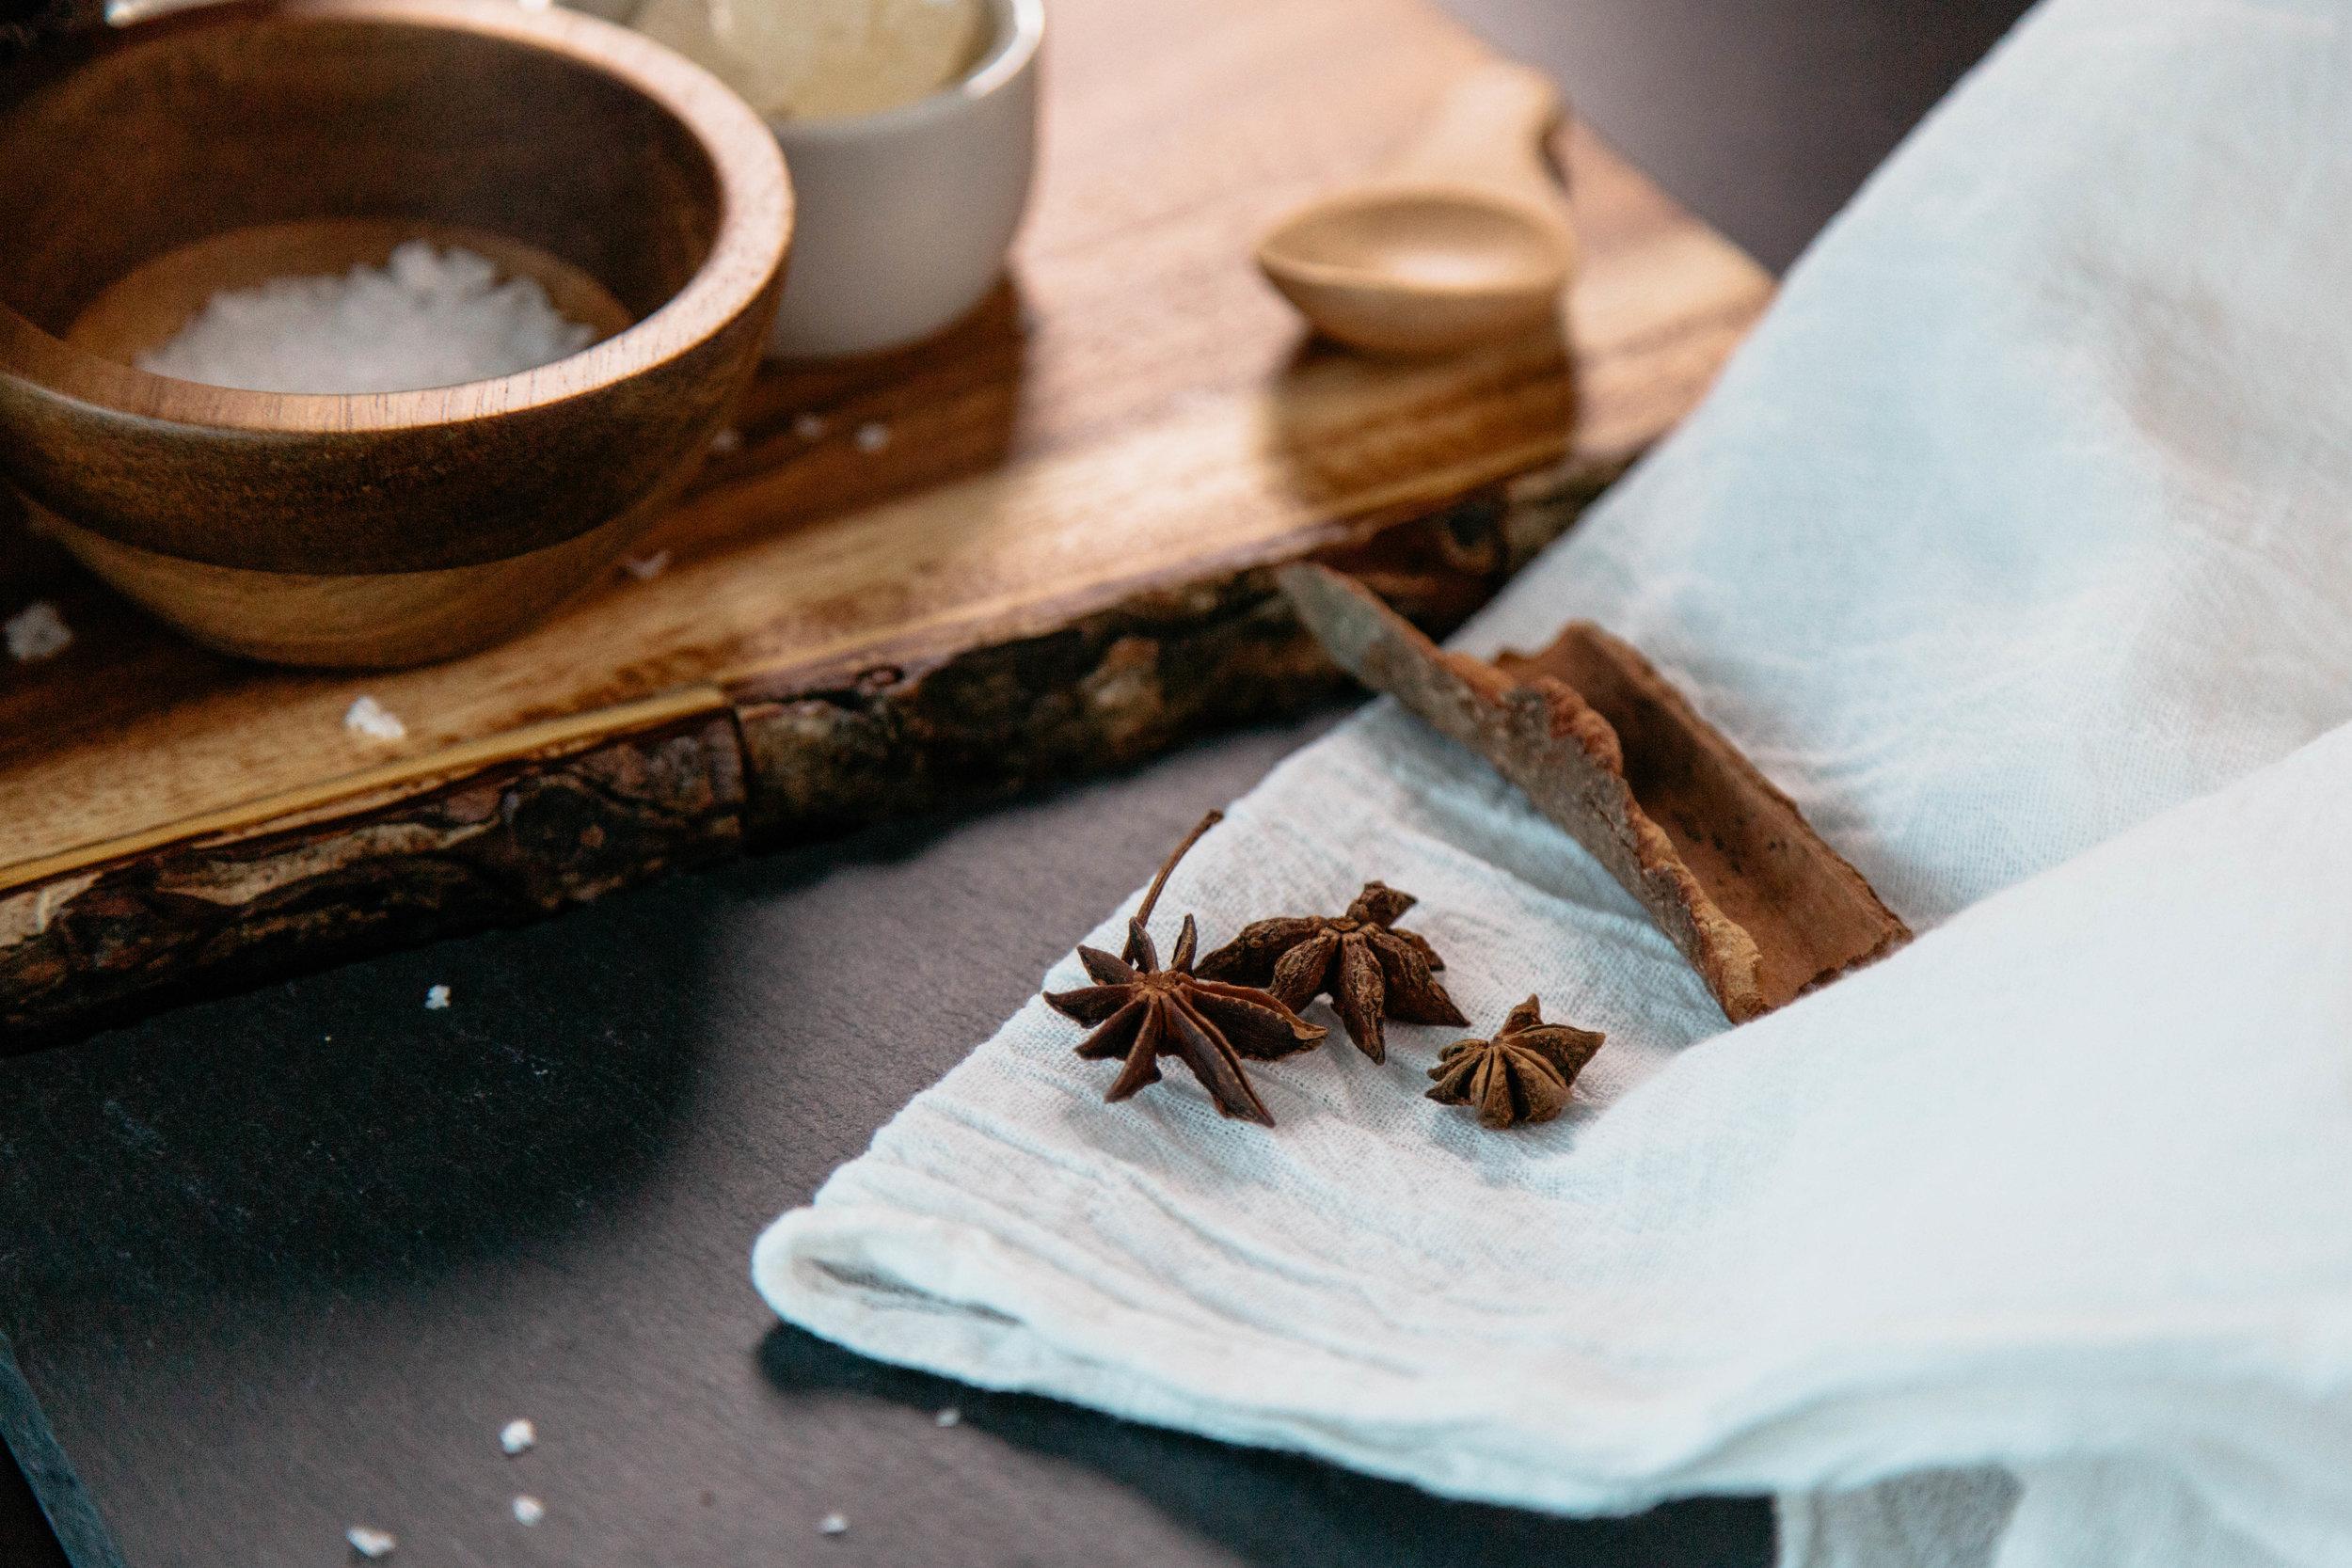 chinese-tea-eggs-anise-cinnamon.jpg